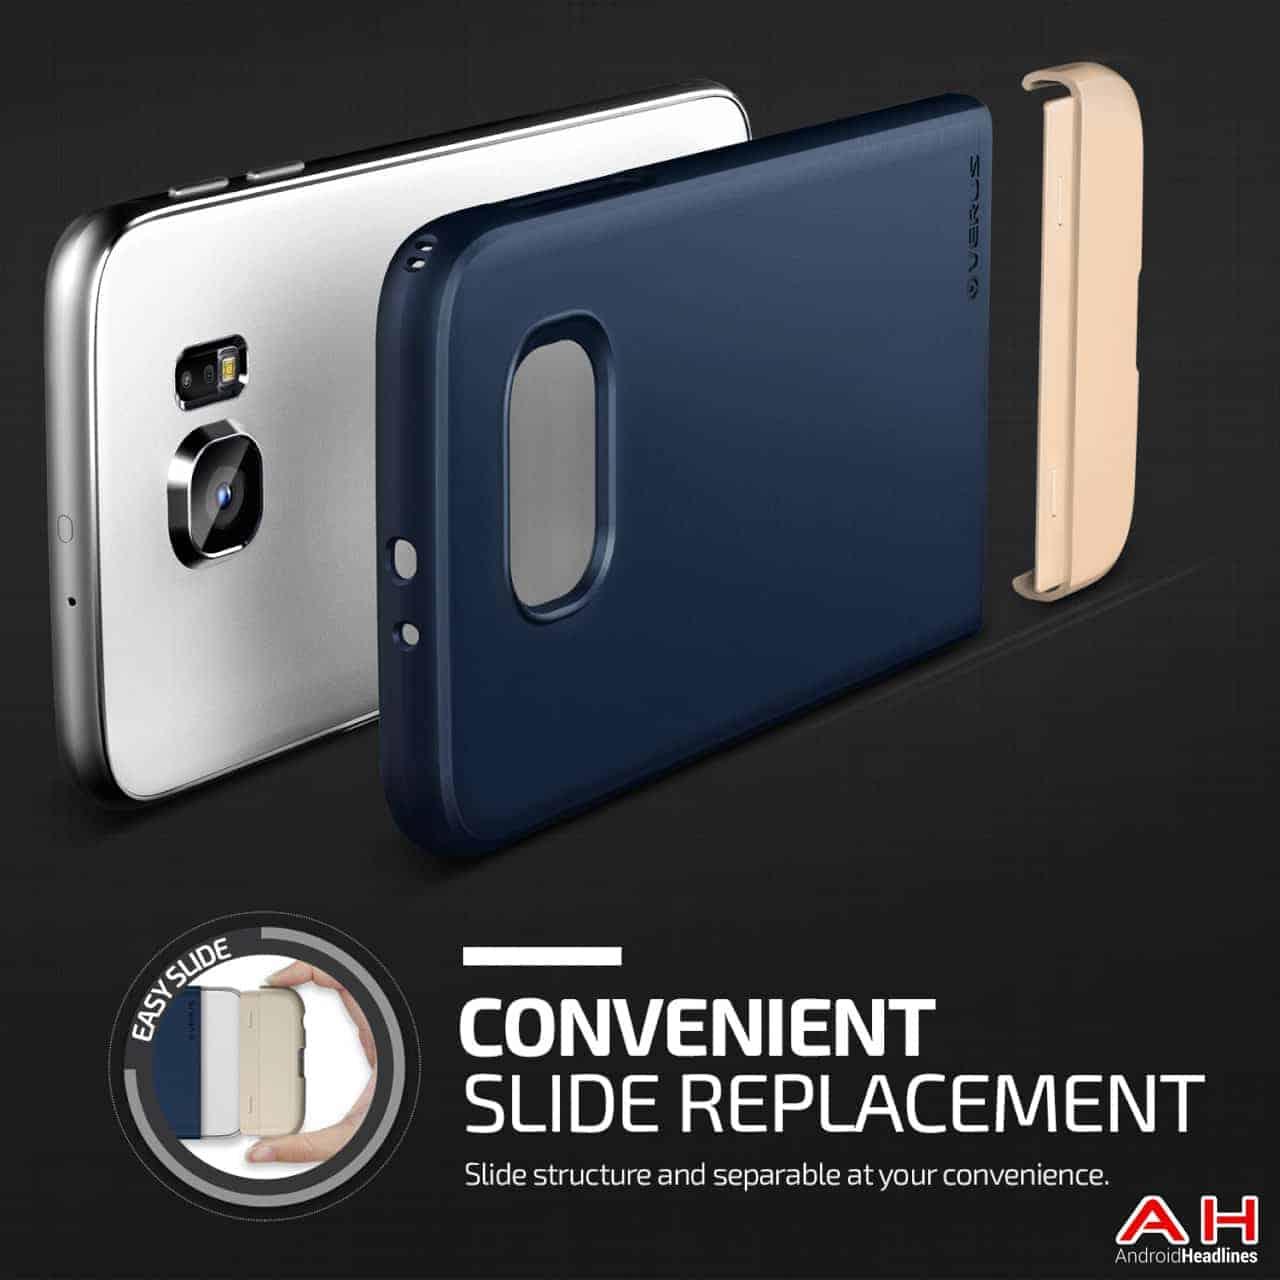 AH Samsung Galaxy S6 Verus Leaked Images 7